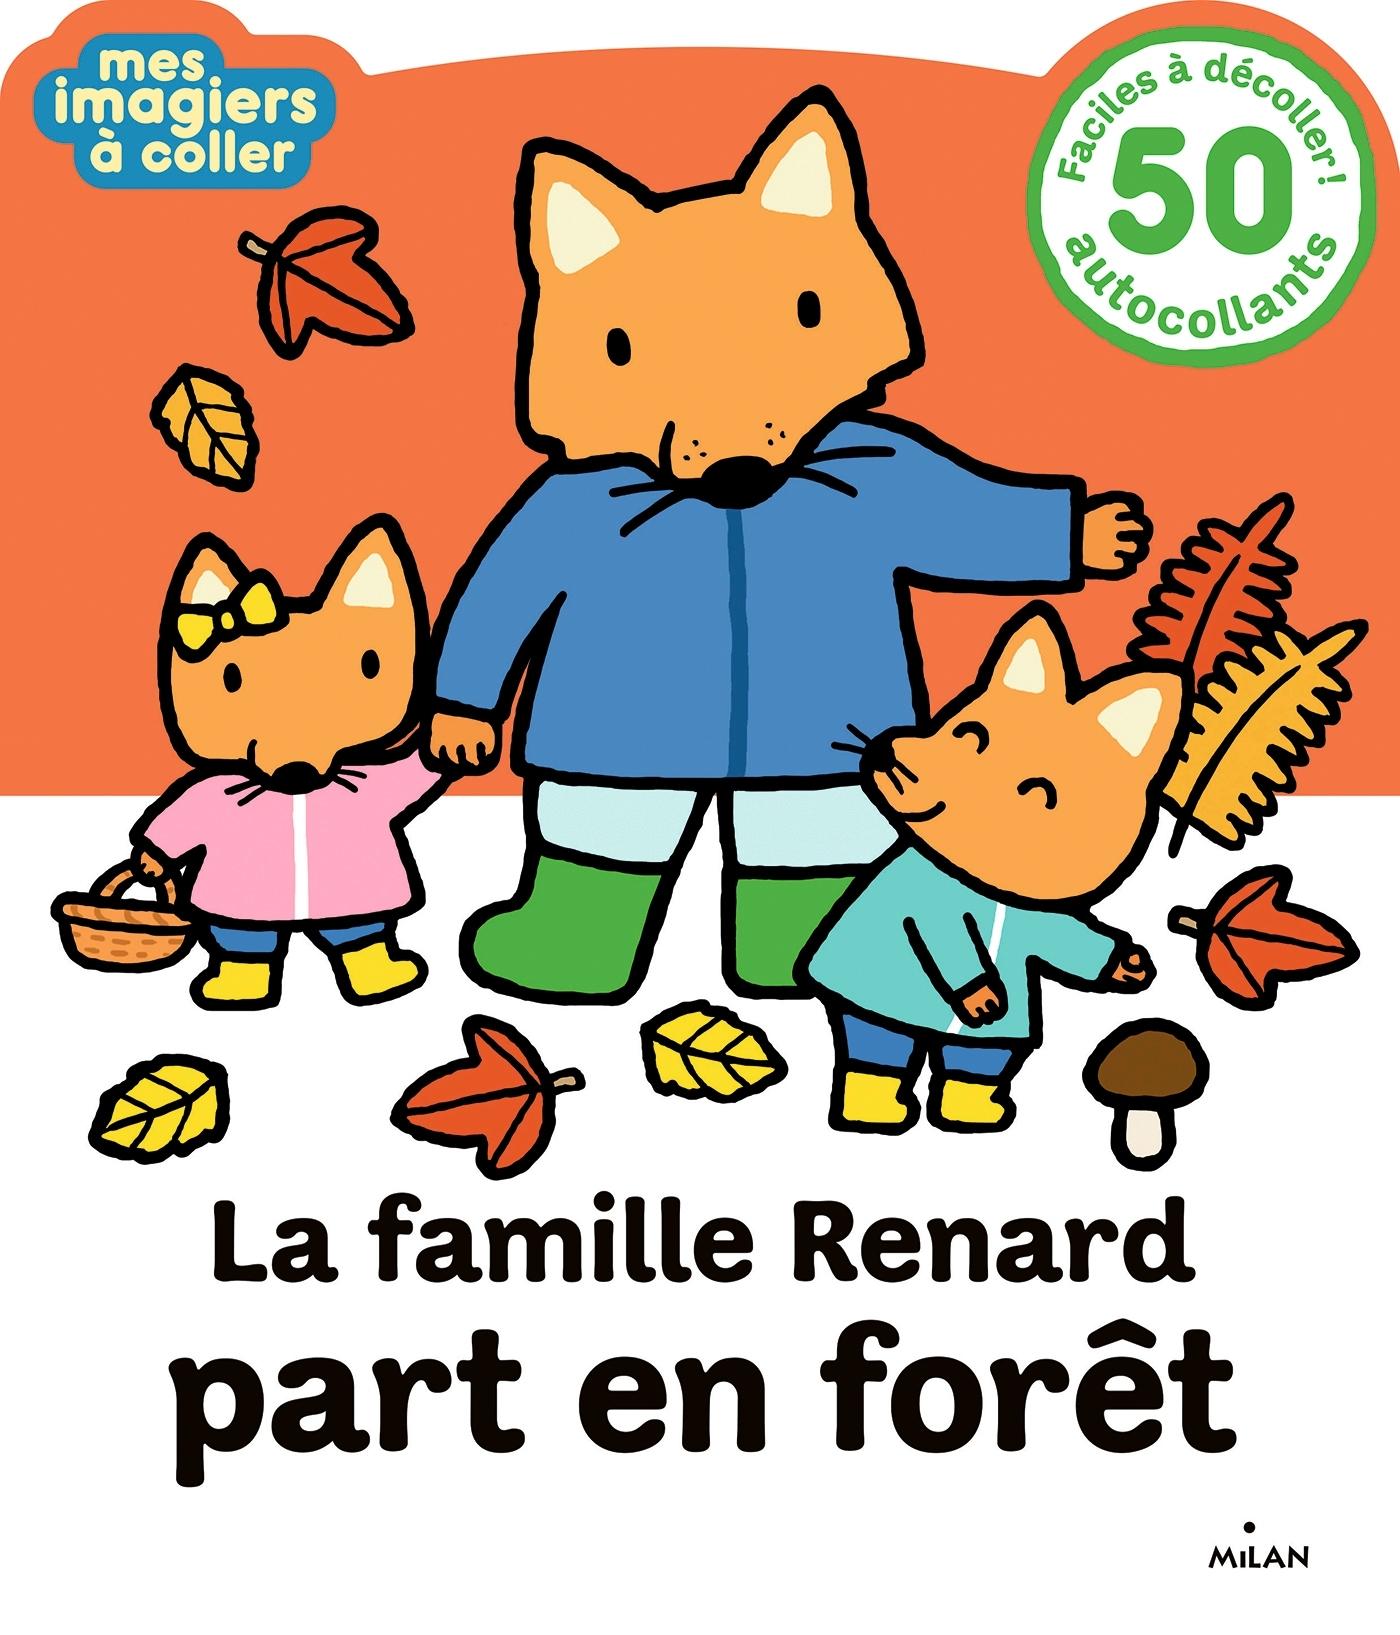 LA FAMILLE RENARD PART EN FORET